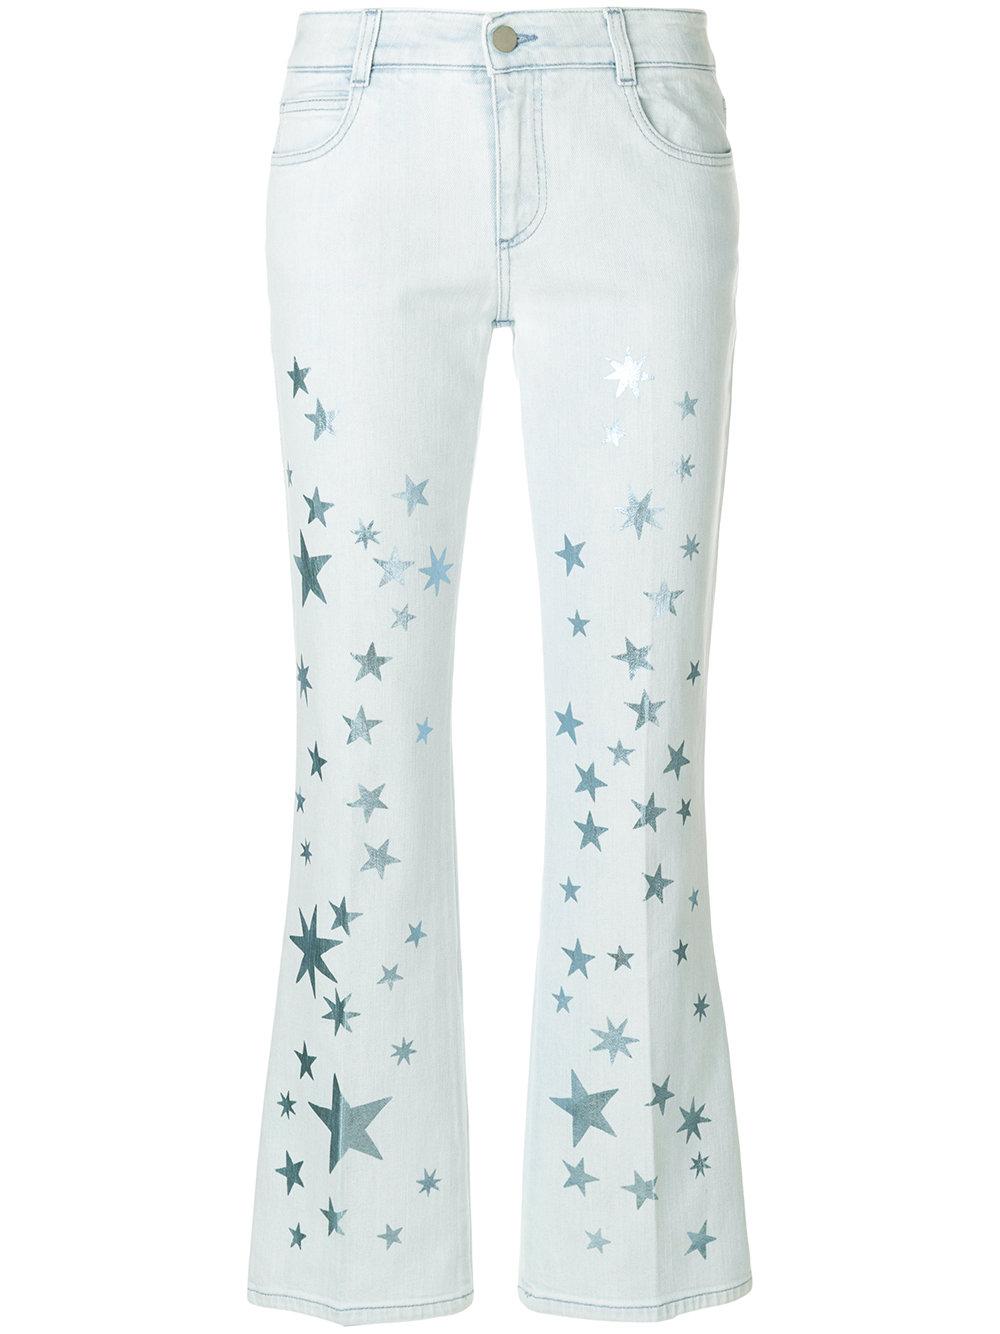 light blue classic five pocket skinny jeans with glittering stars all over  STELLA MC CARTNEY |  | 475508-SKH054300